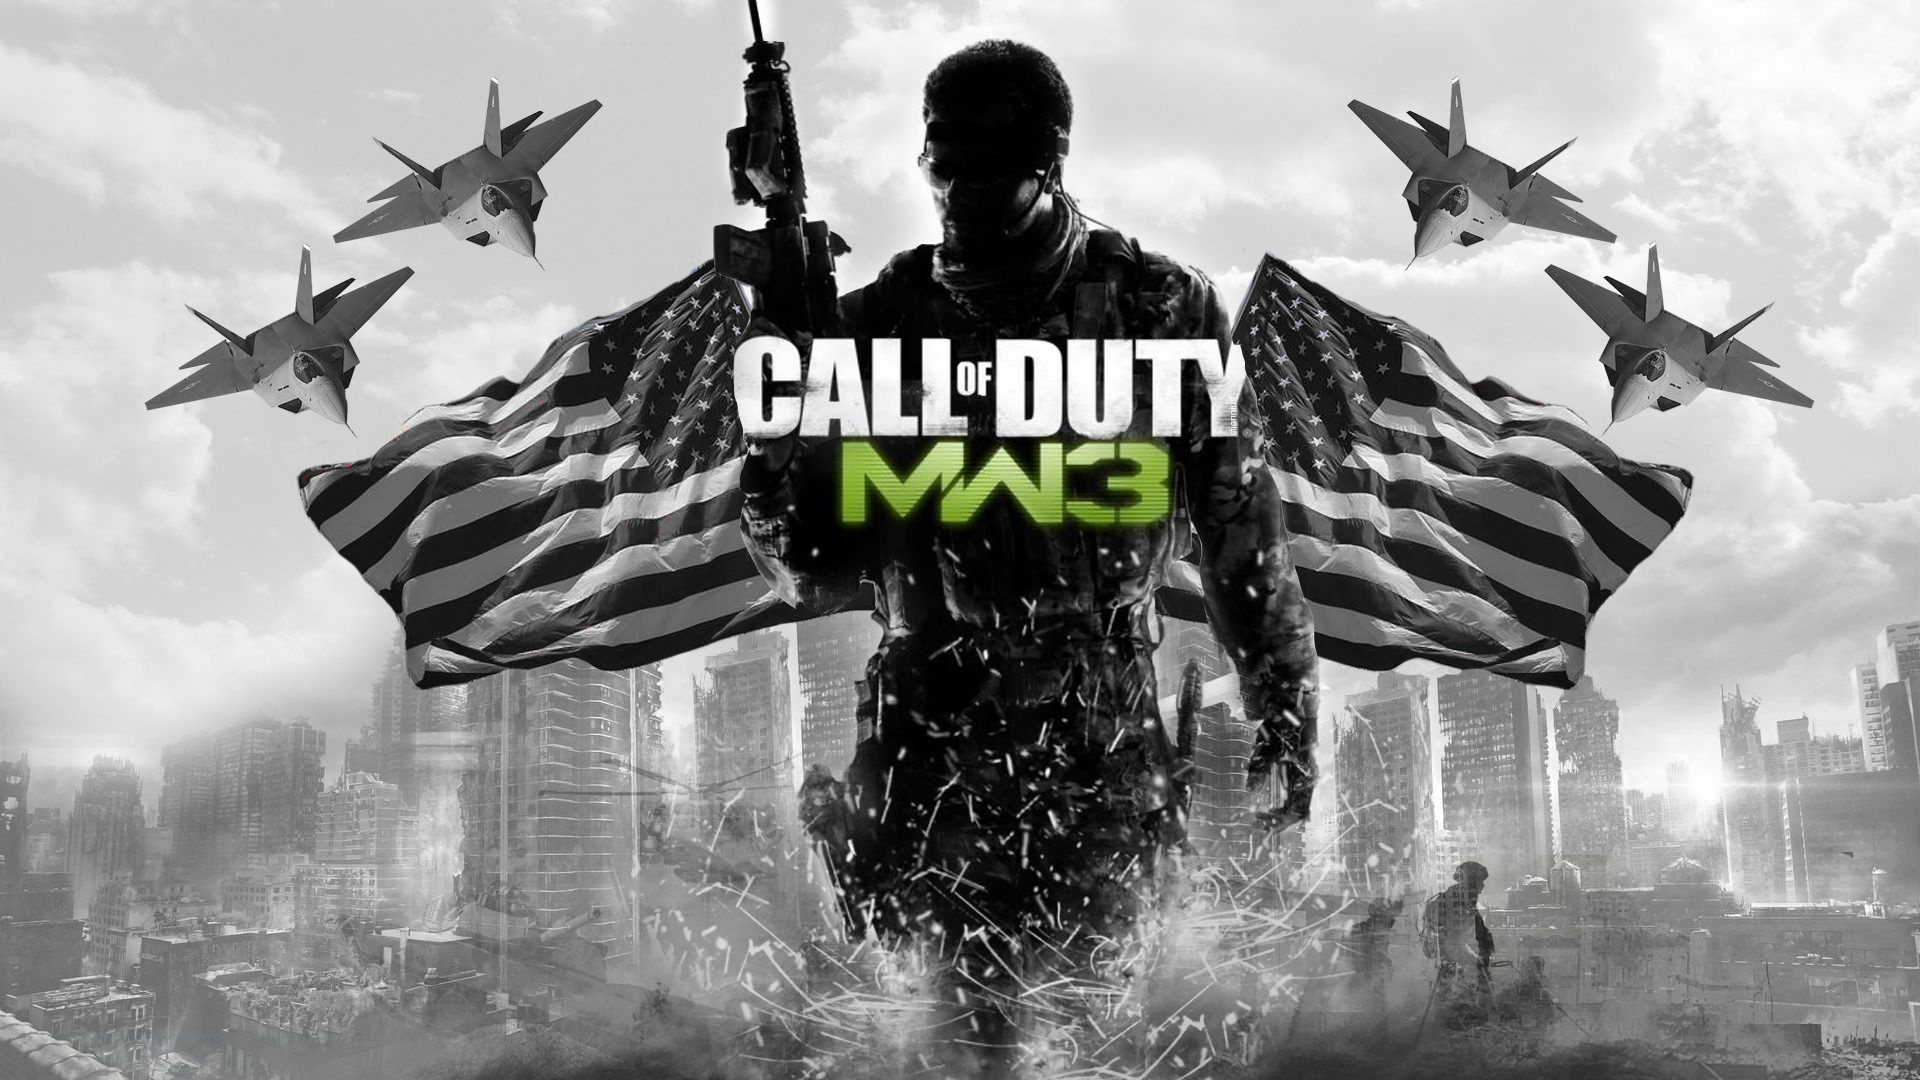 Free Download Call Of Duty Modern Warfare 3 Wallpaper Hd Game